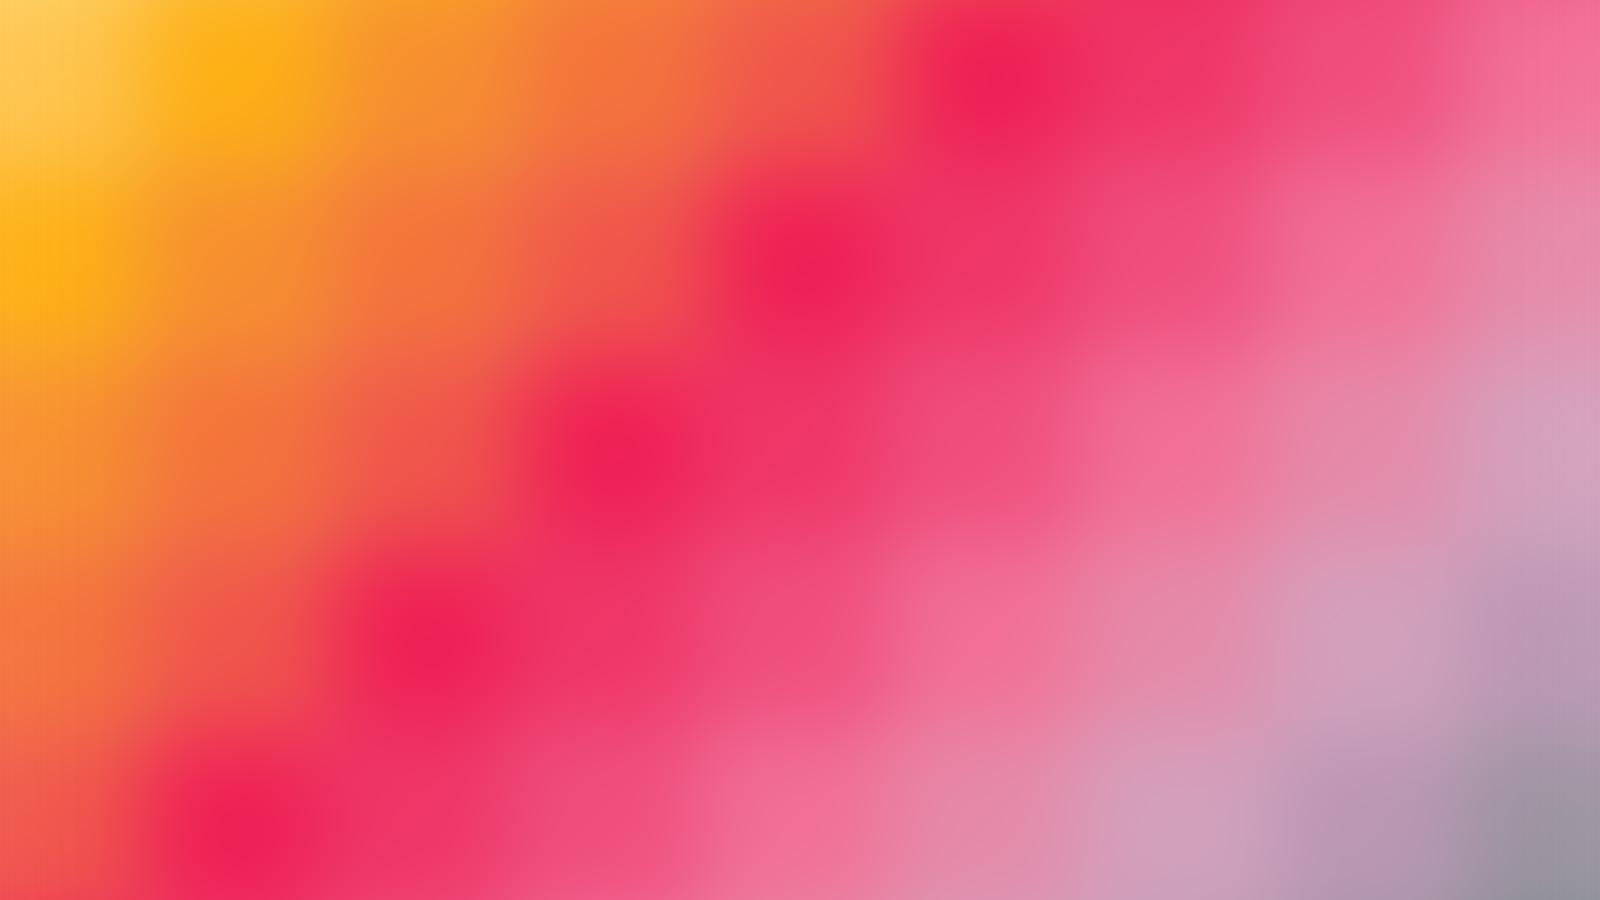 Batman Iphone 7 Wallpaper Wallpaper For Desktop Laptop Si03 Rainbow Red Dots